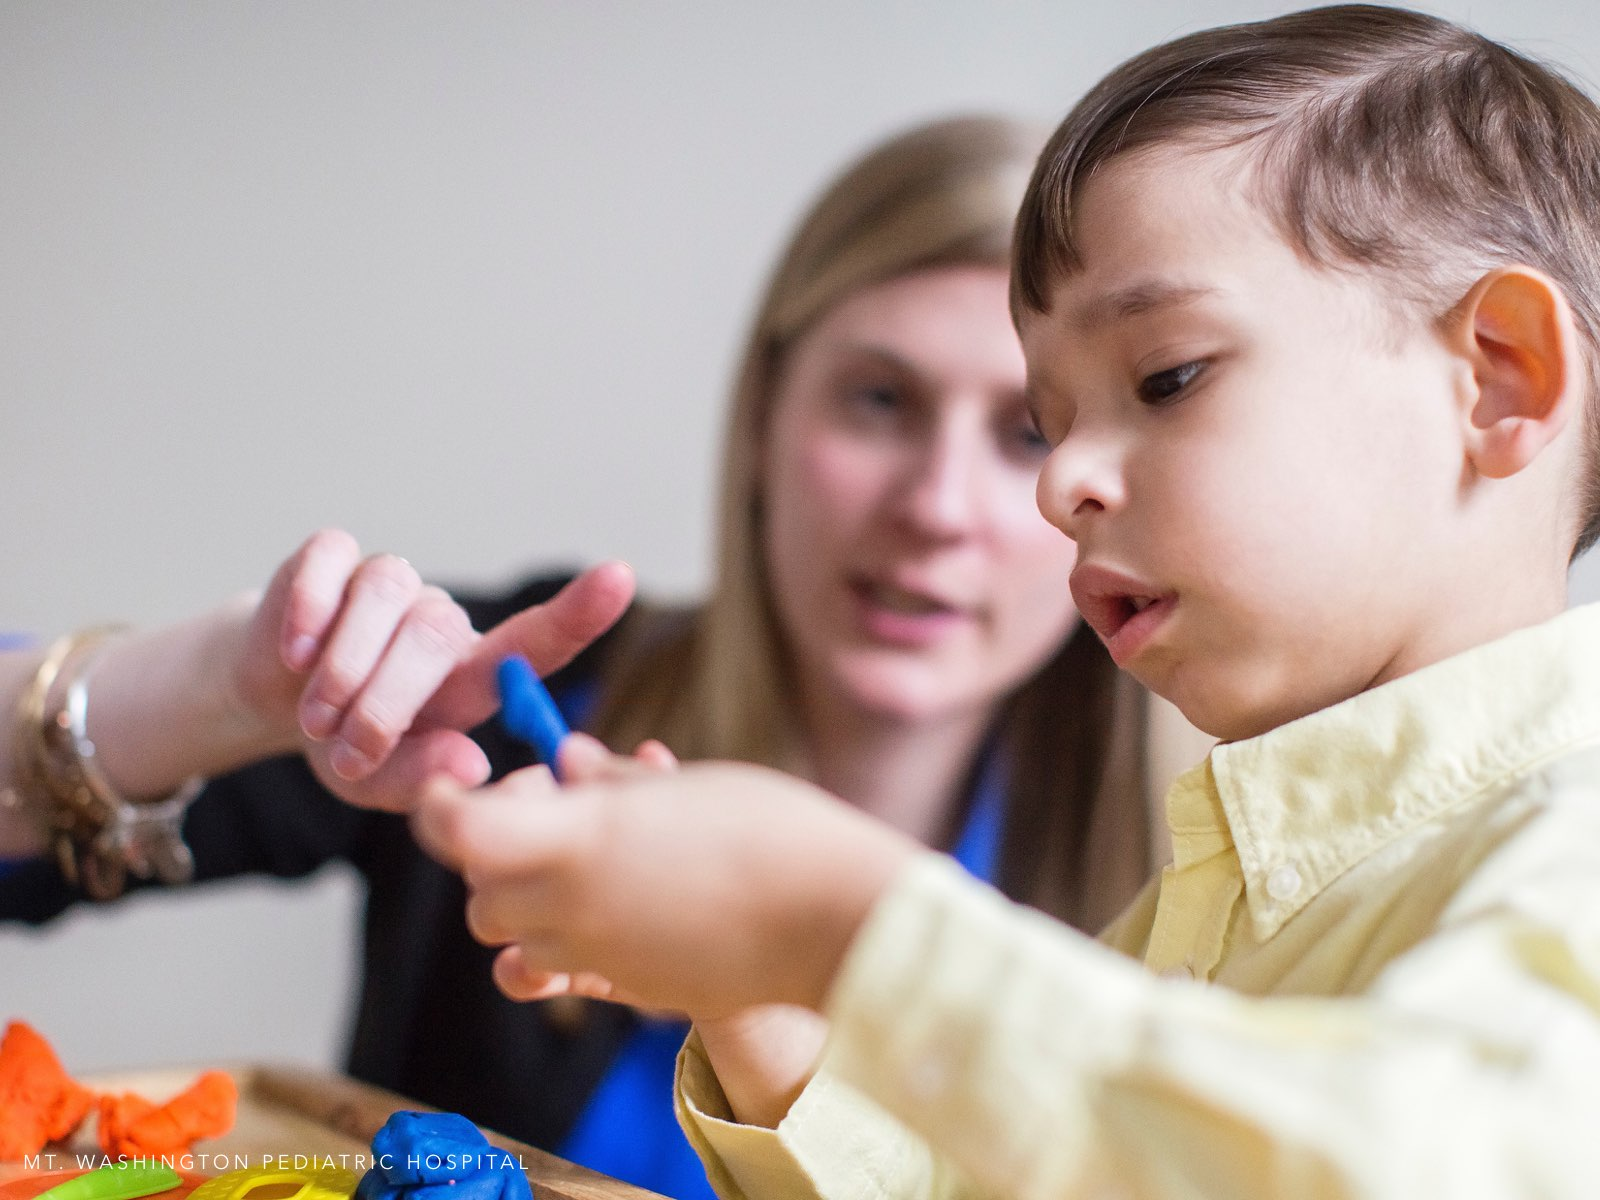 Autism Therapeutic Services at Mt. Washington Pediatric Hospital - (cool) progeny